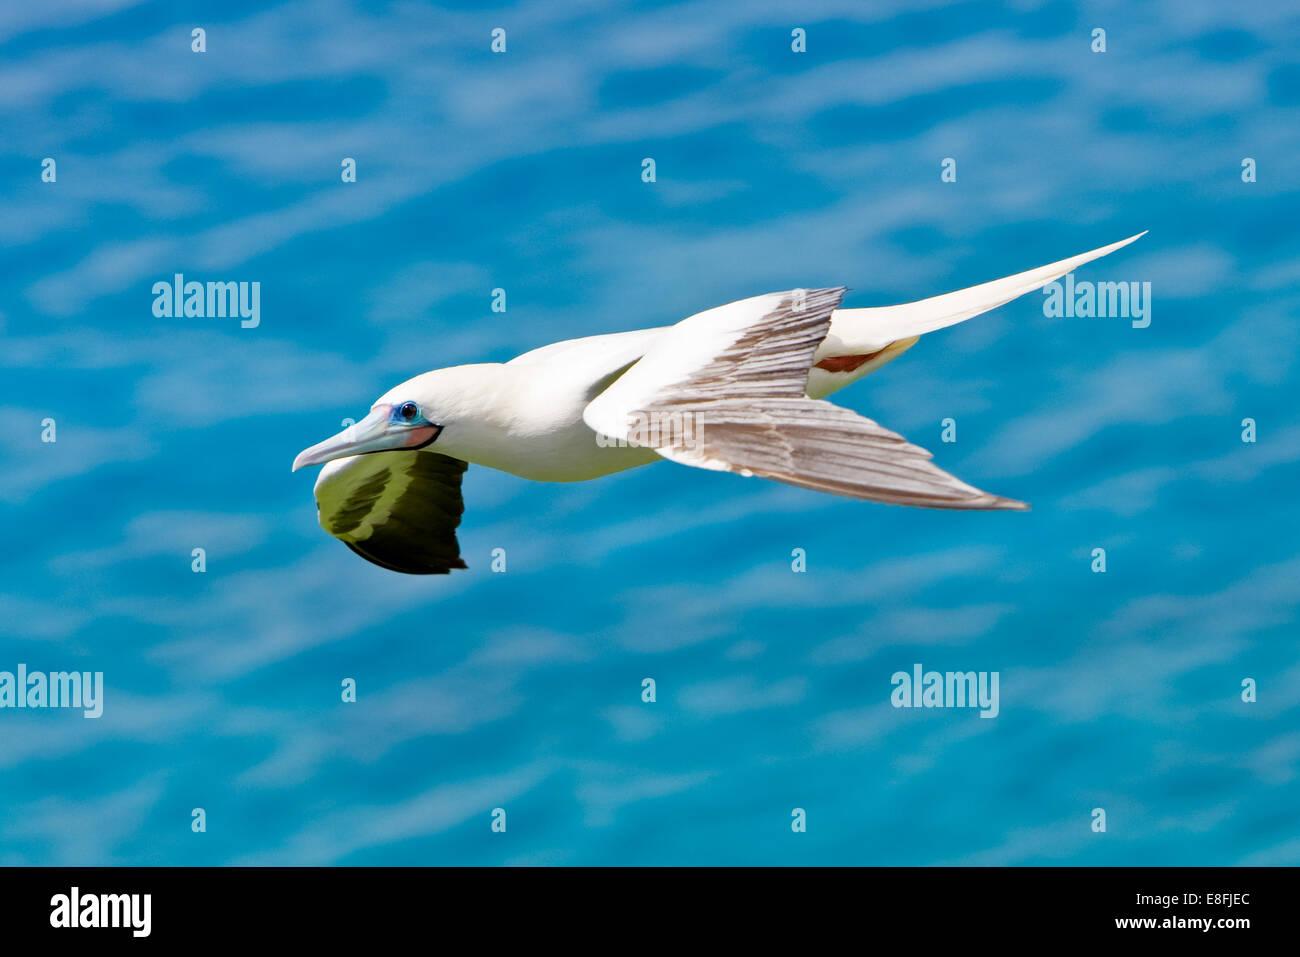 Northern Mariana Islands, Rota Municipality, Rota, Bird in flight - Stock Image